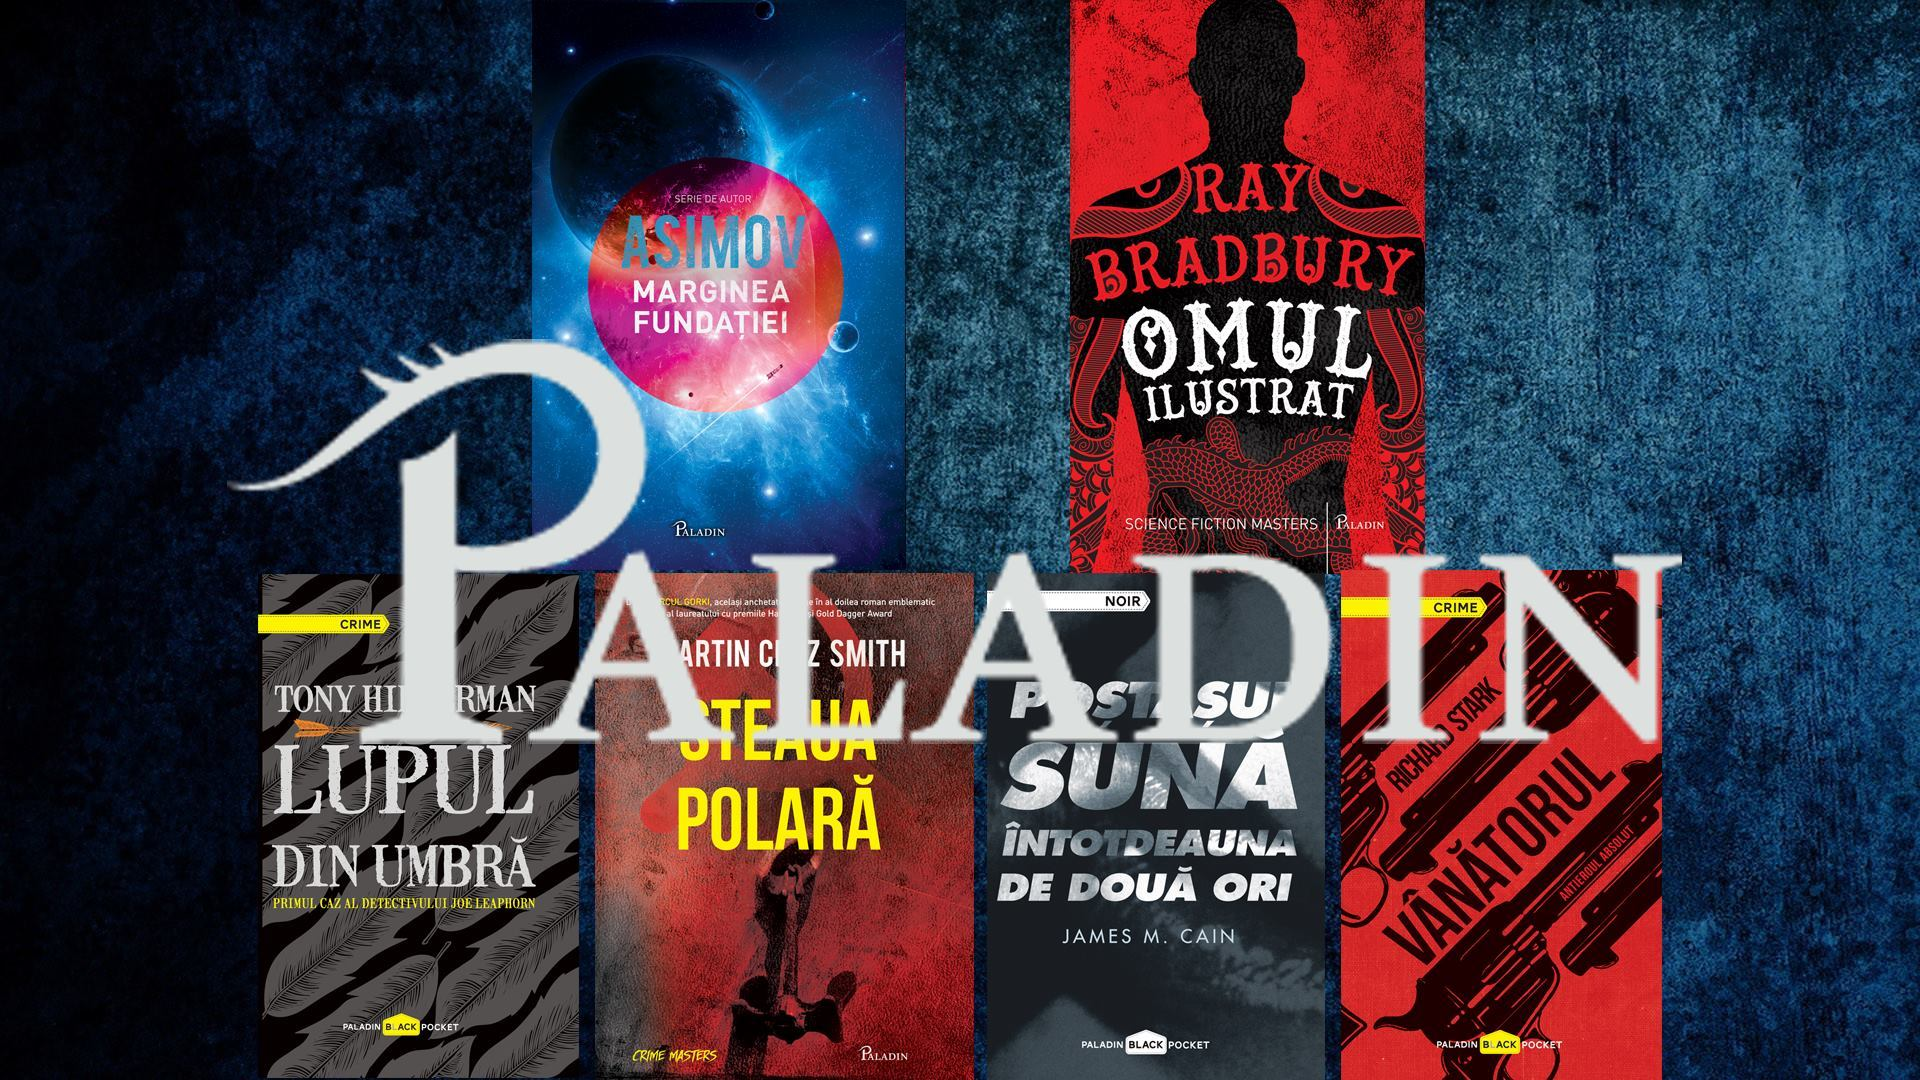 Lansările editurii Paladin - Bookfest 2016